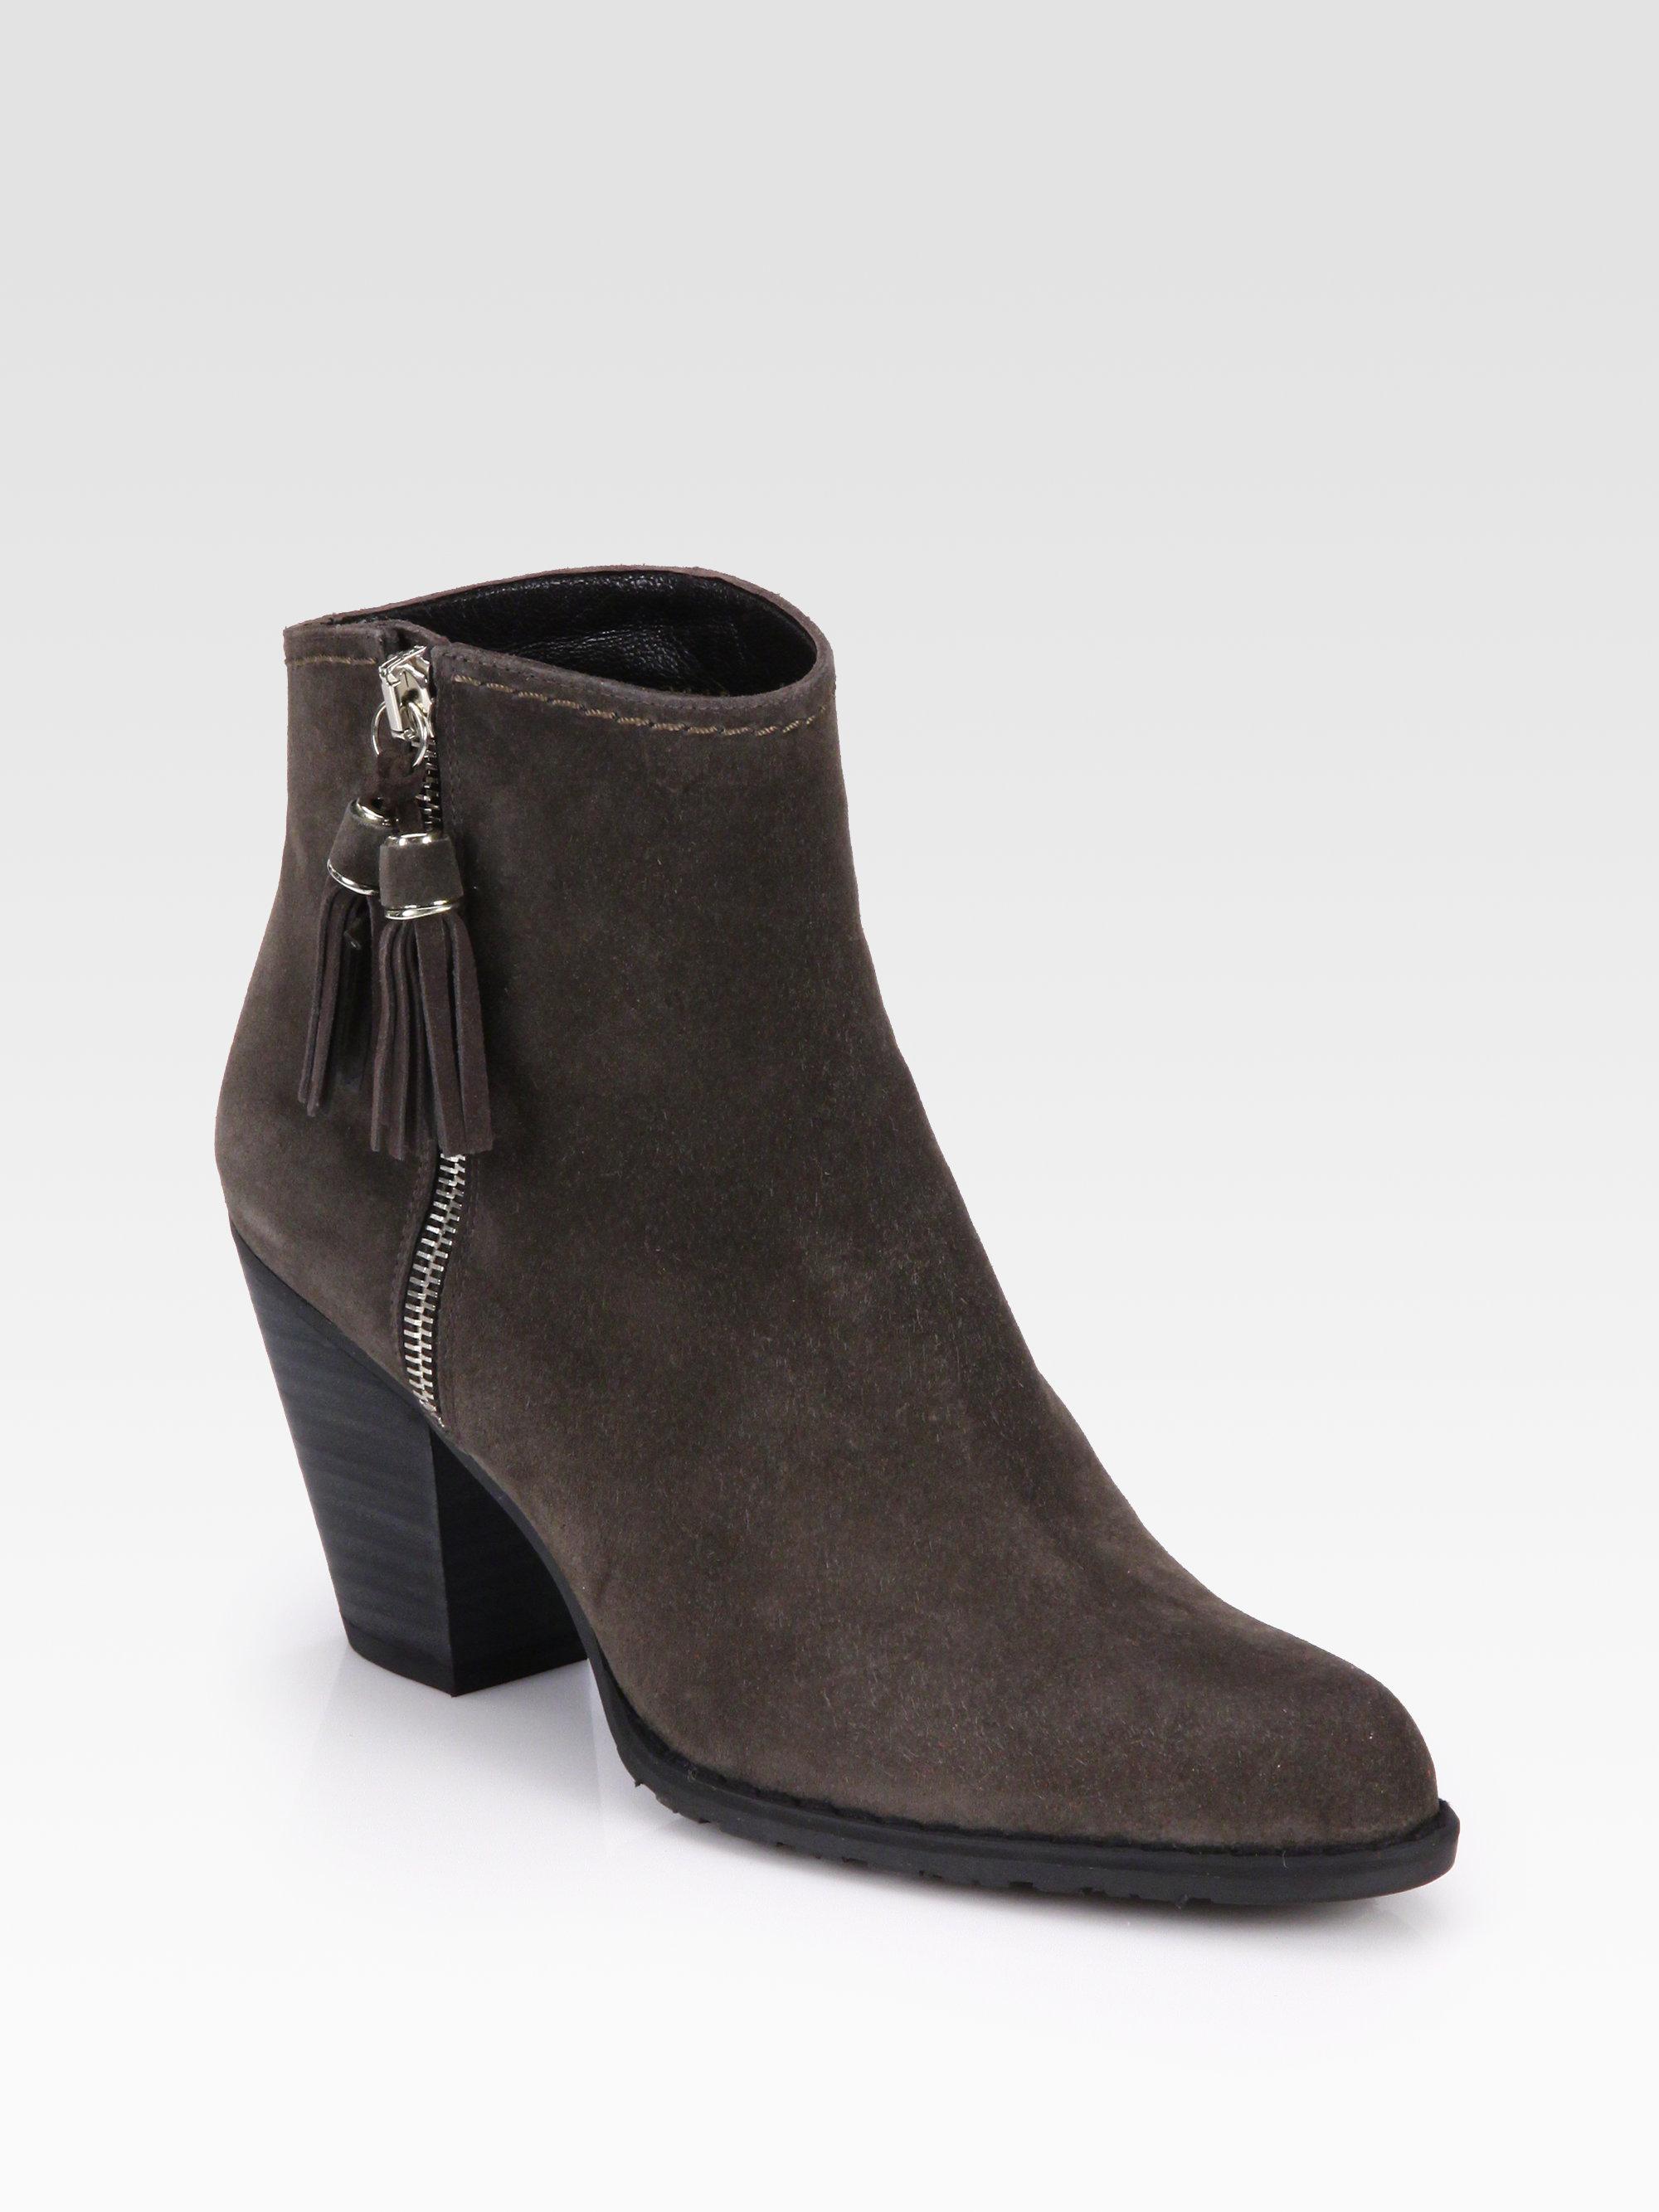 stuart weitzman suede tassel ankle boot in brown lyst